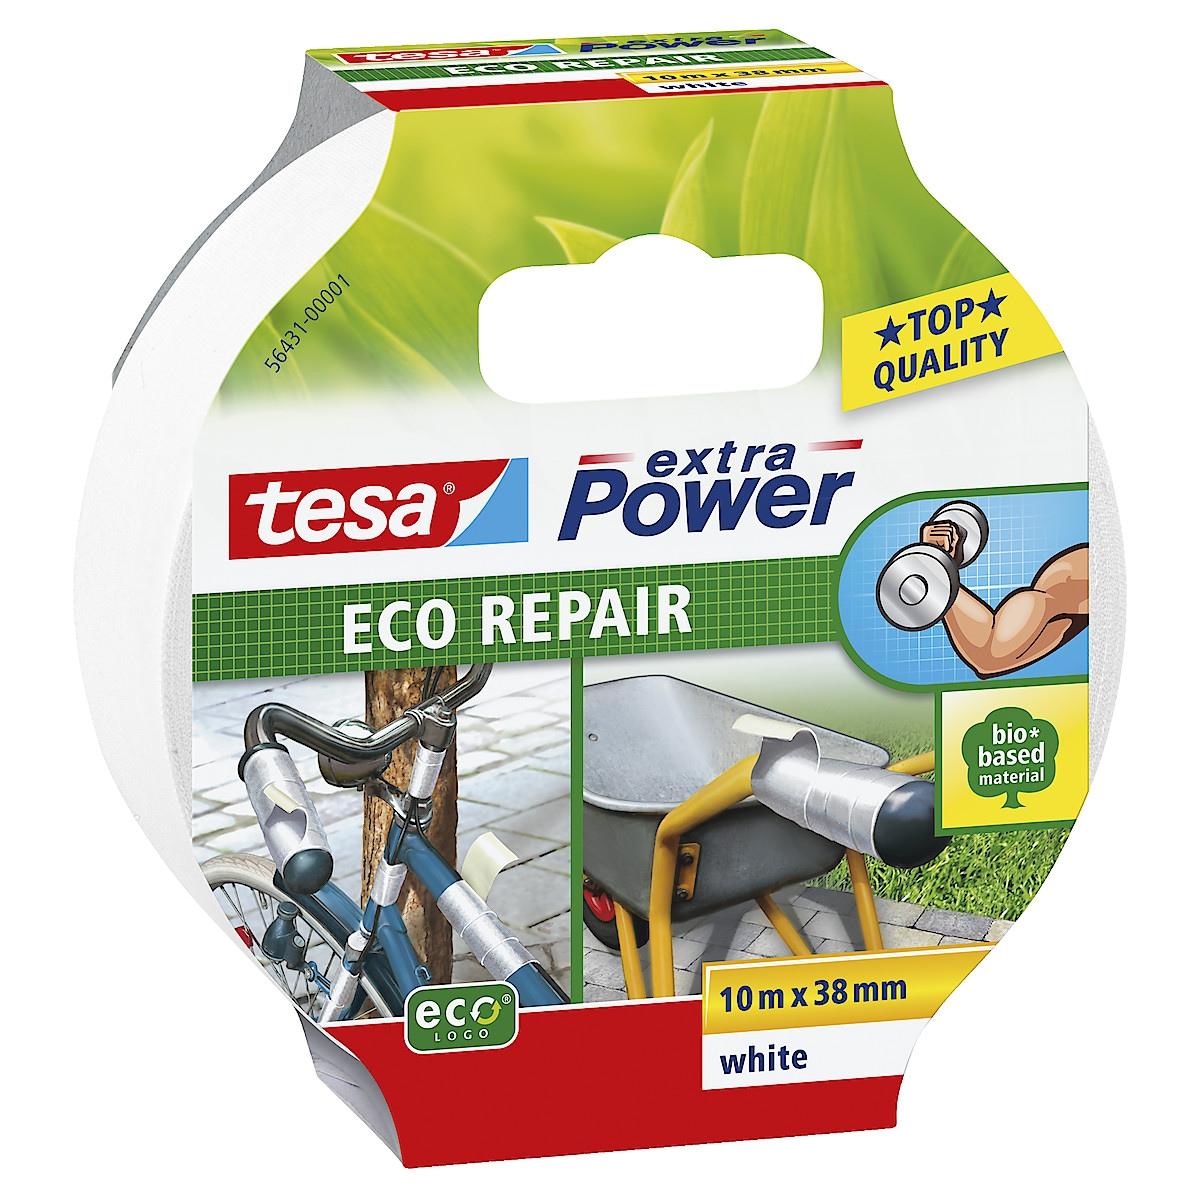 Vävtejp Tesa Eco Repair Extra Power